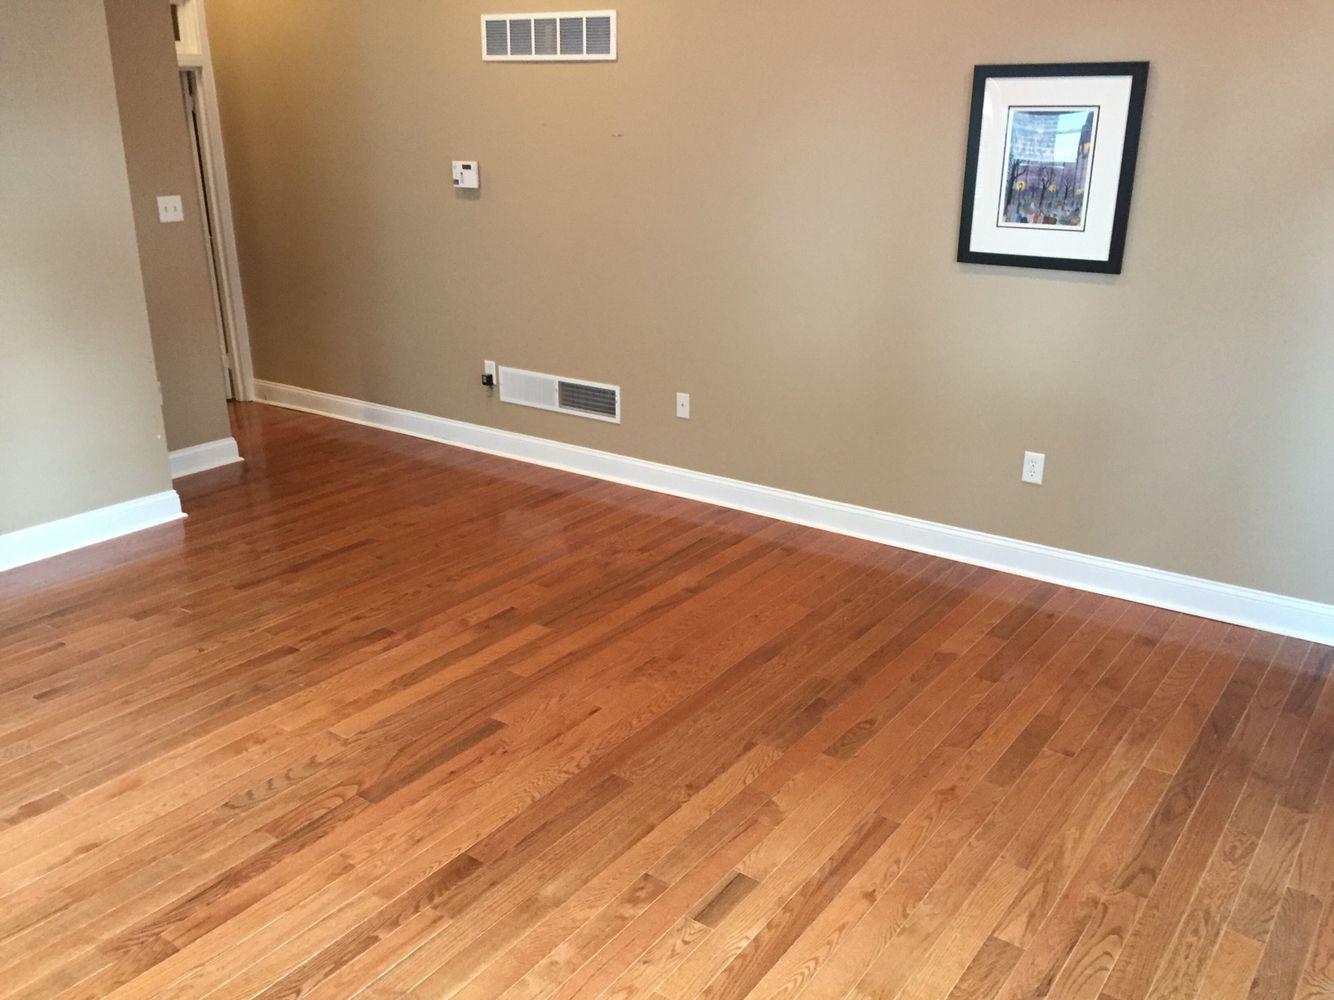 3 1 4 Red Oak In A Gunstock Finish 302 494 8179 Flooring Wood Floors Red Oak